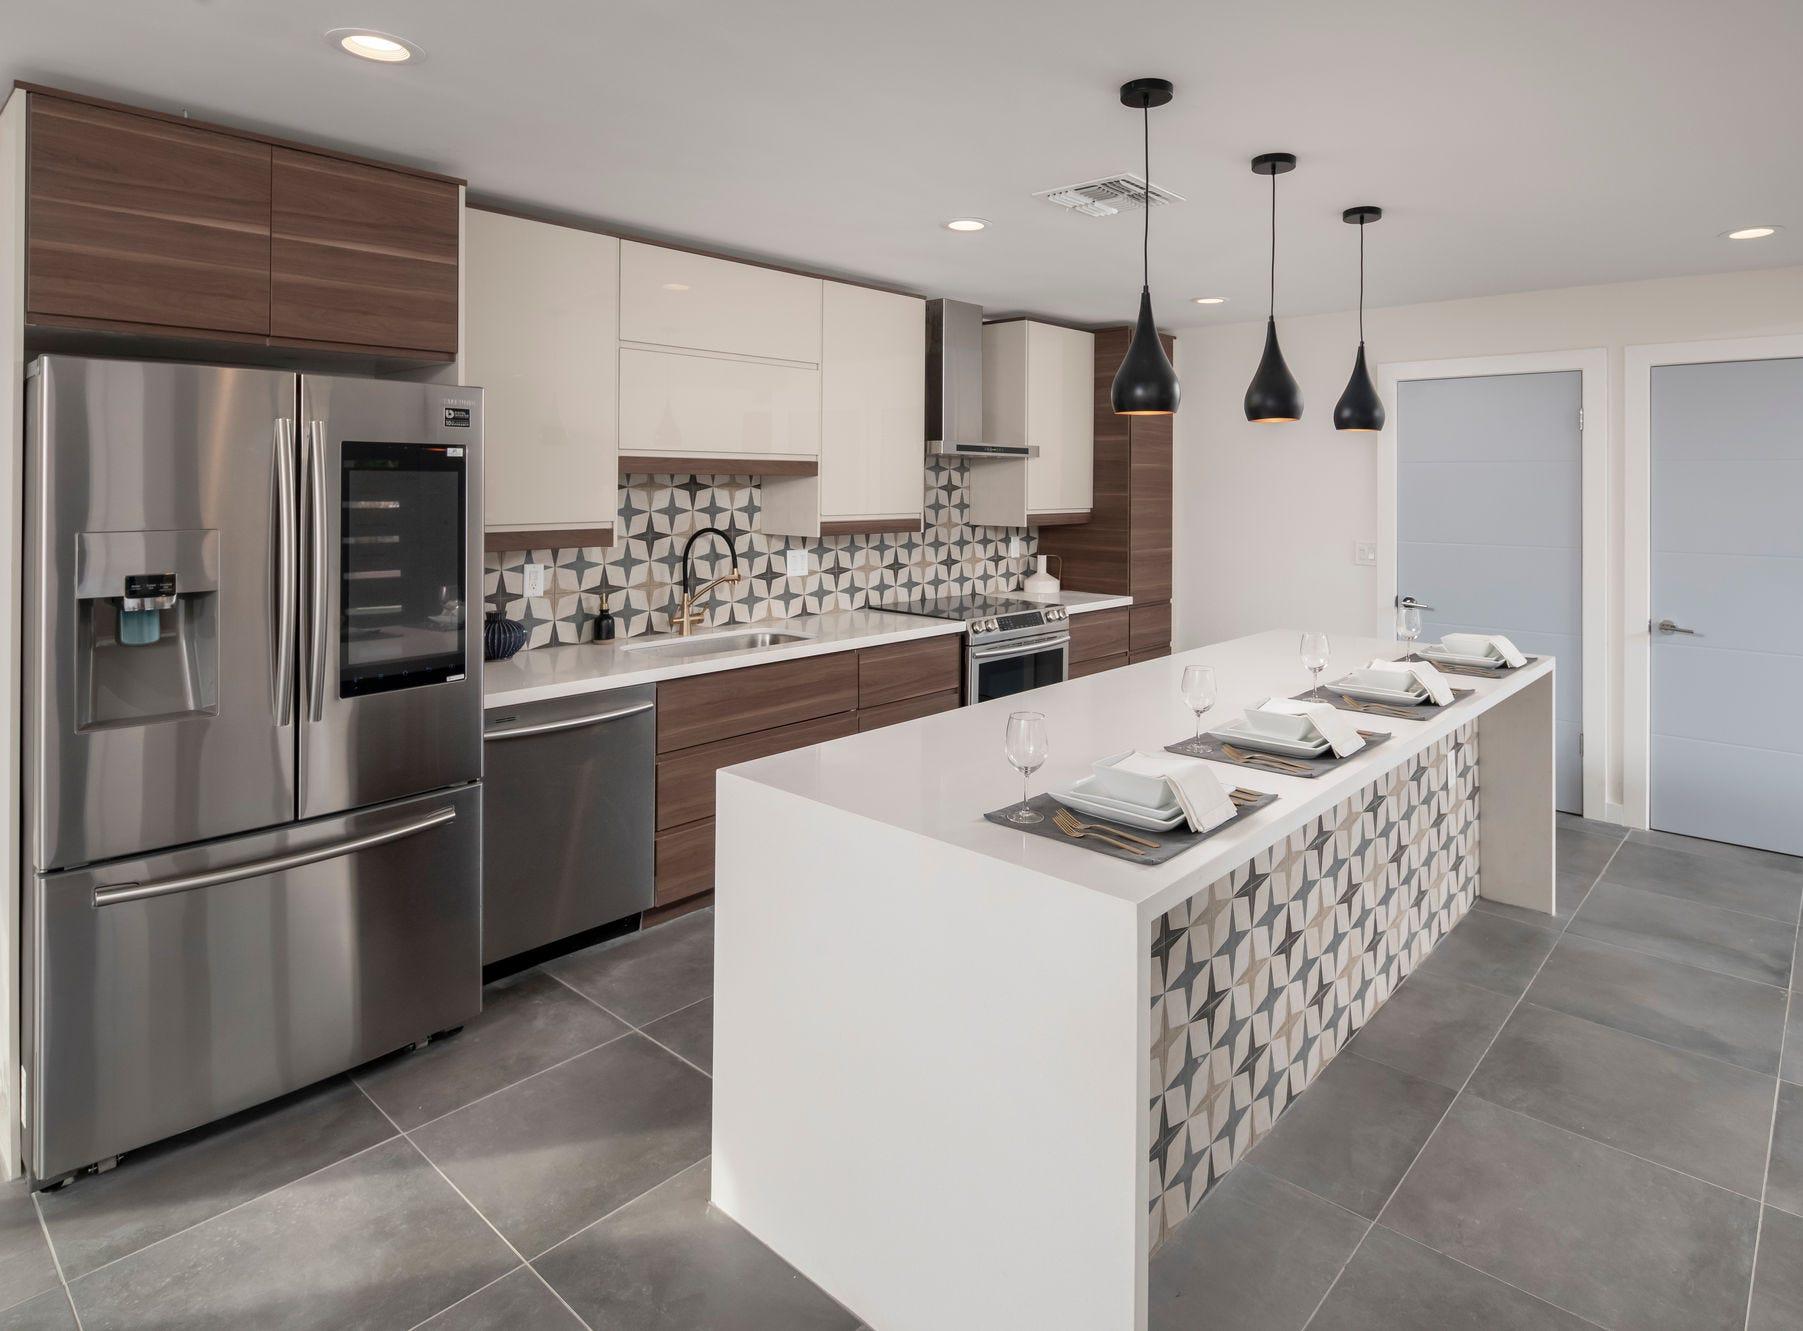 Midcentury meets modern in this kitchen.